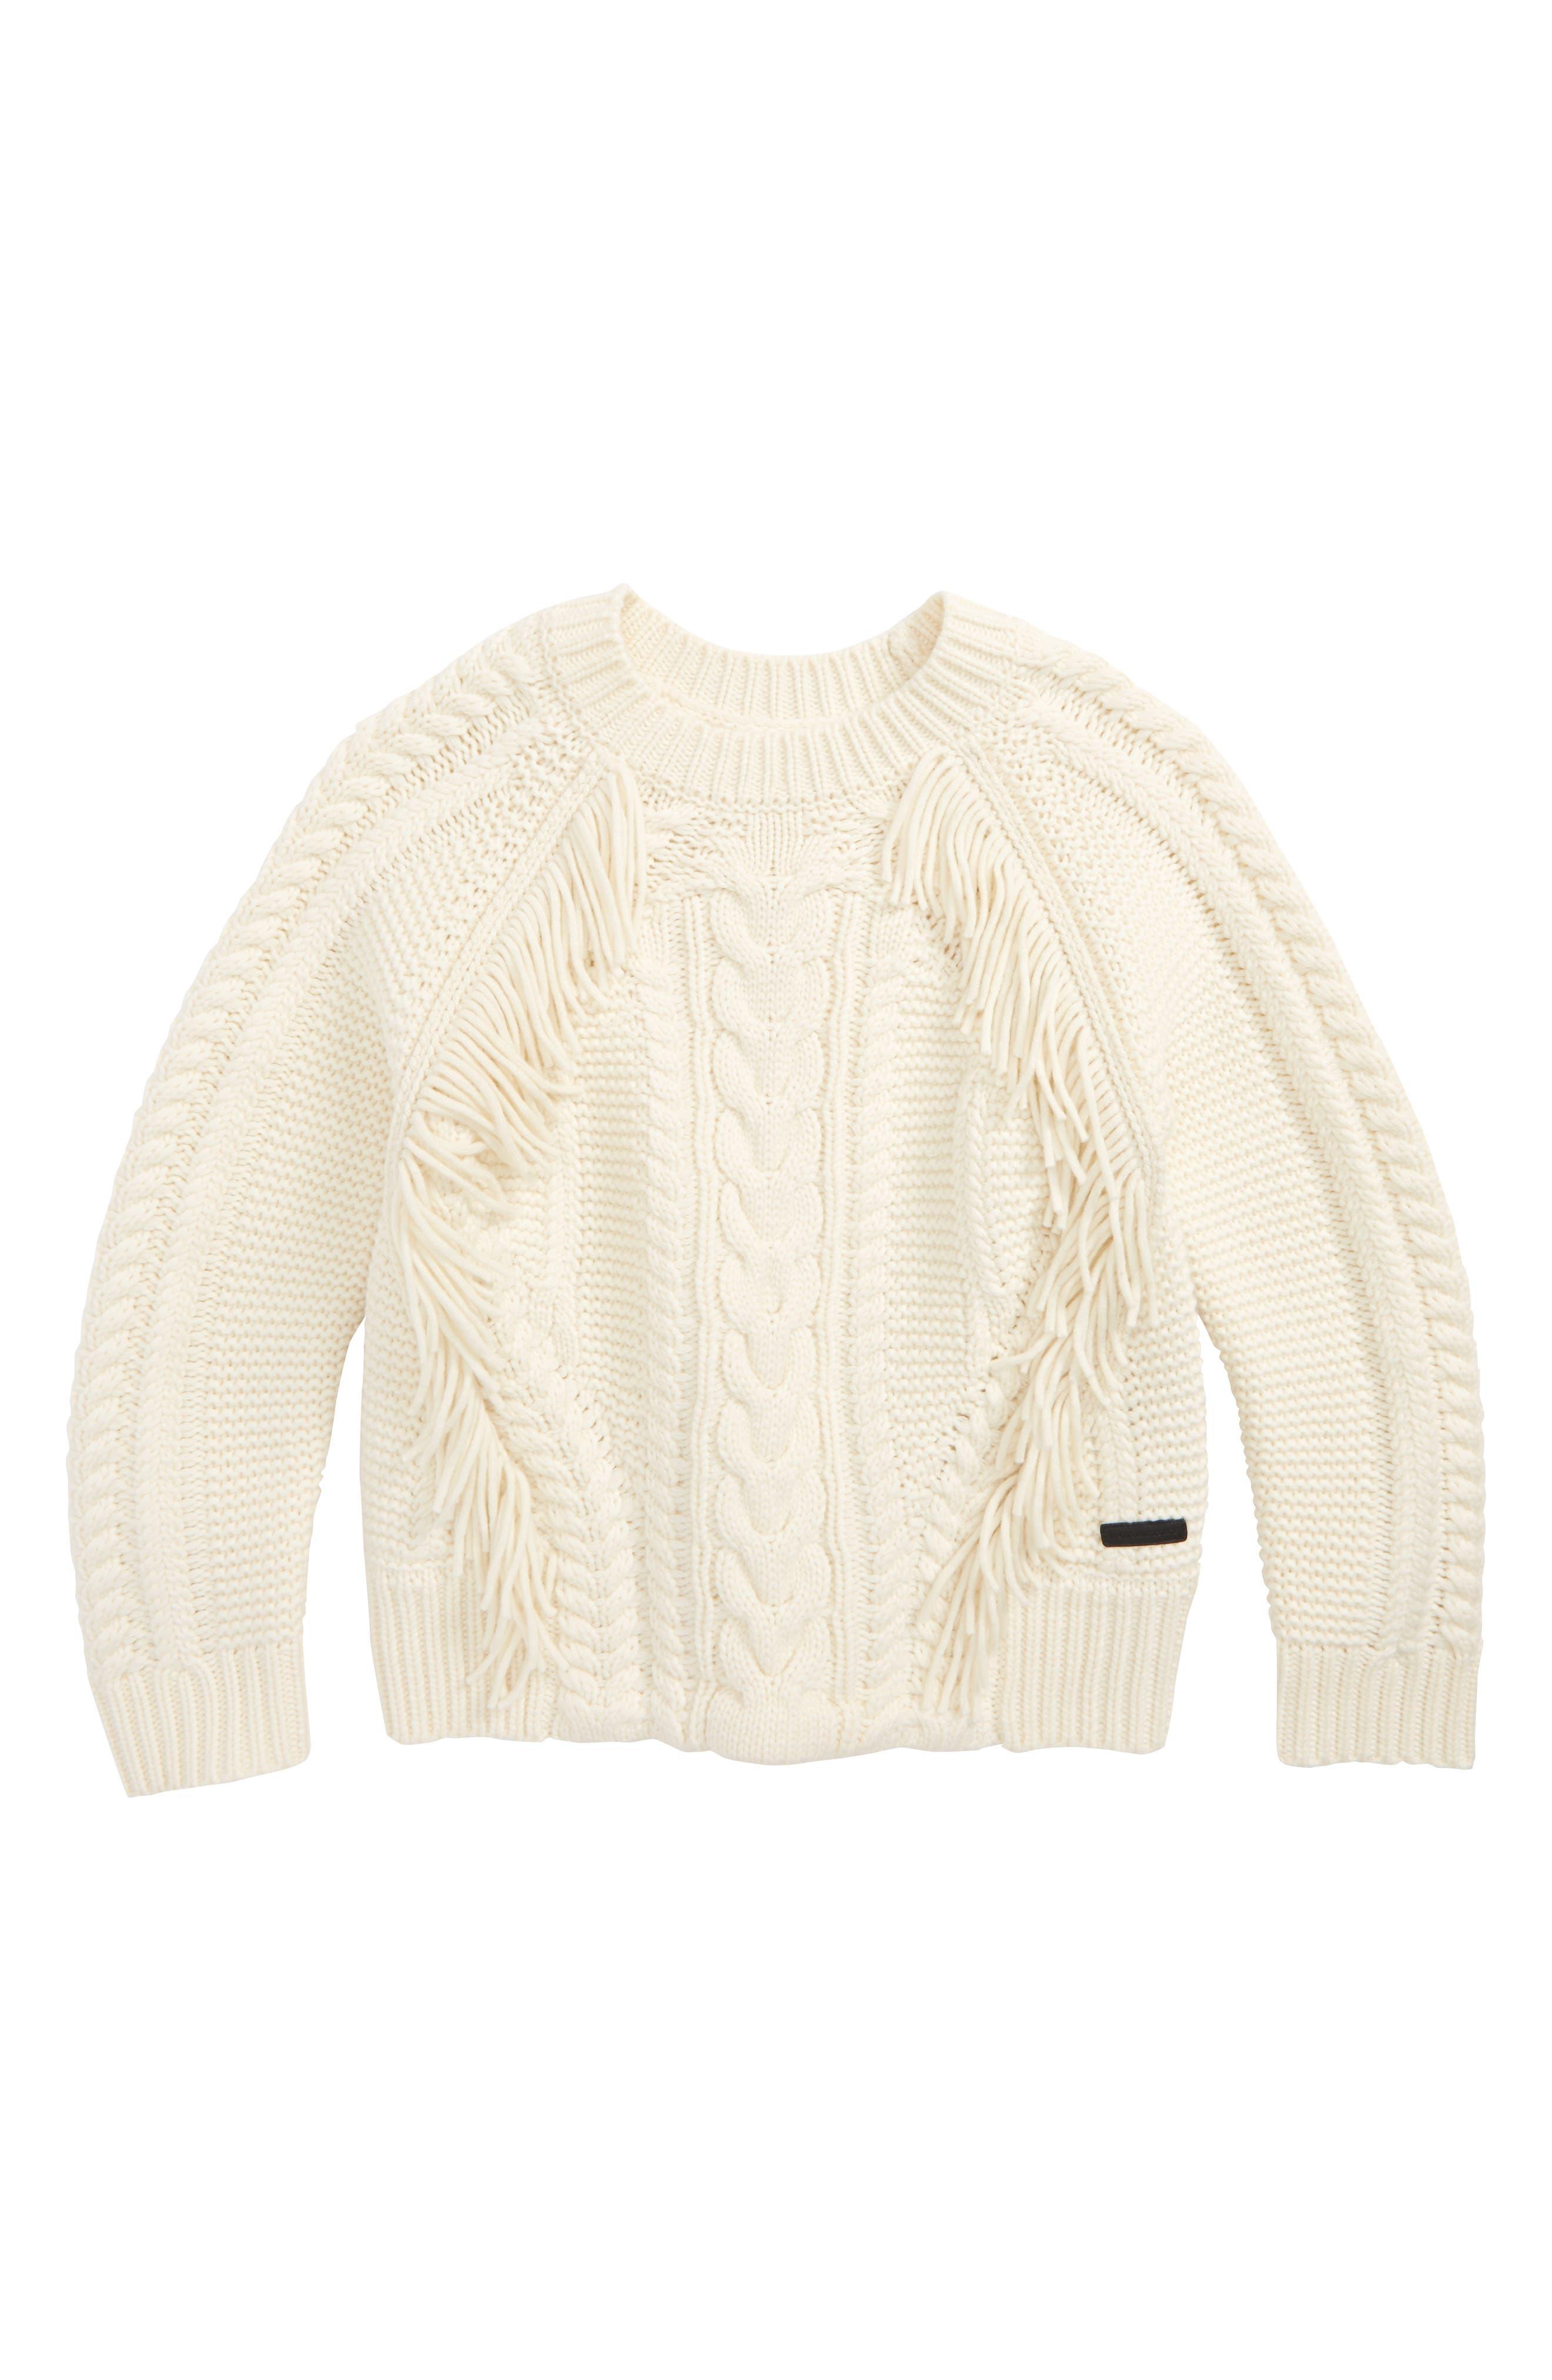 Natasia Cable Knit Sweater,                             Main thumbnail 1, color,                             Natural White